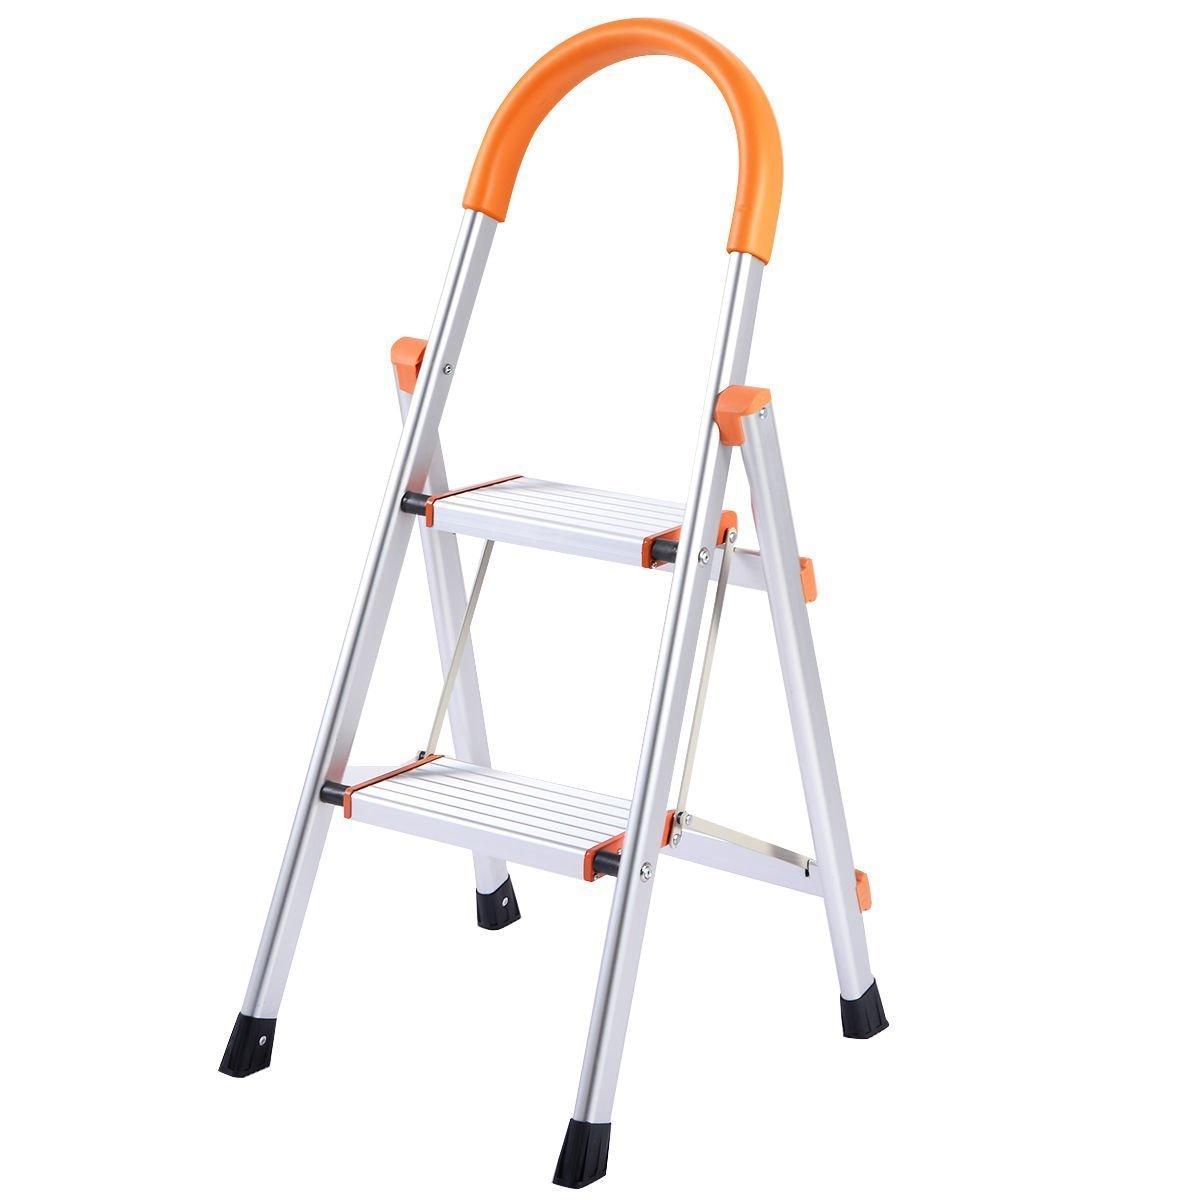 Giantex 2 Step Ladder Folding Stepladder Rating 3-Foot Ladder Aluminum Step Stool Ladder Folding Platform Stool 330 lbs Load Capacity Lightweight Multi-Use Ladder w/Anti-Slip Handgrip and Wide Pedal